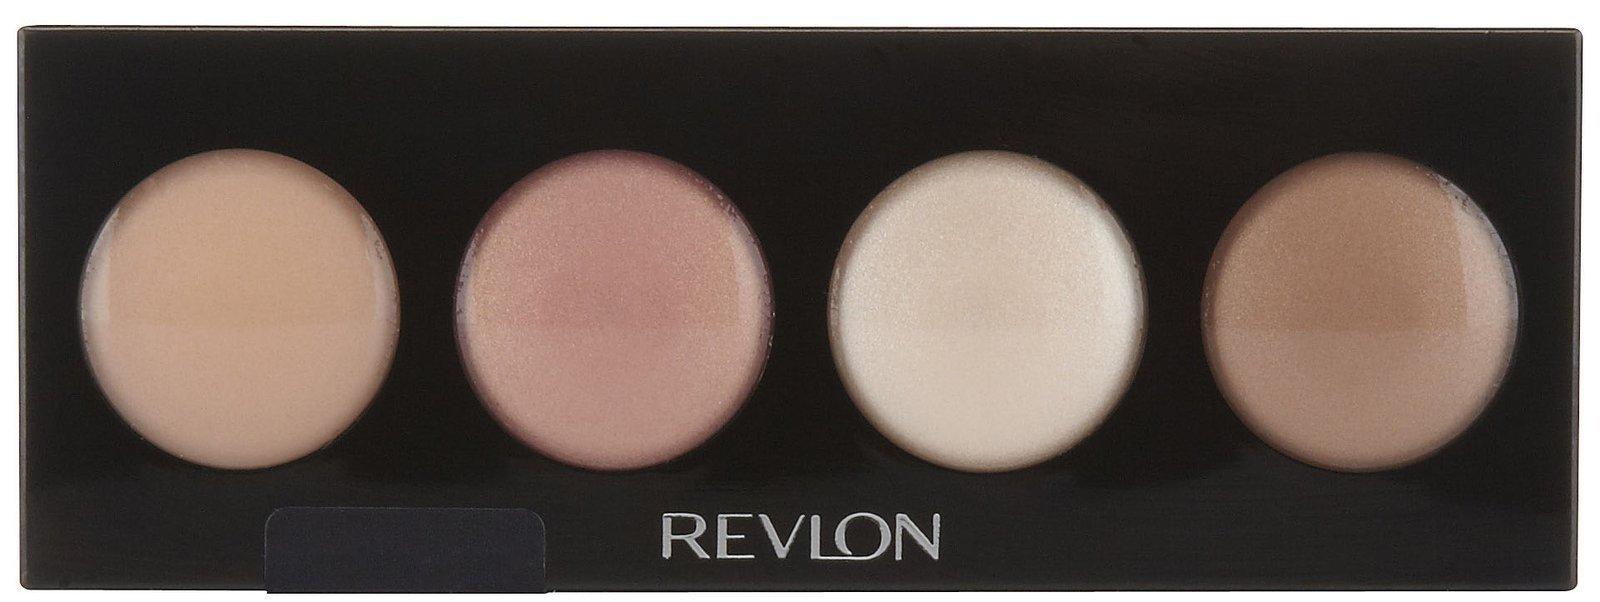 Revlon Creme Shadow - Skinlights (730)